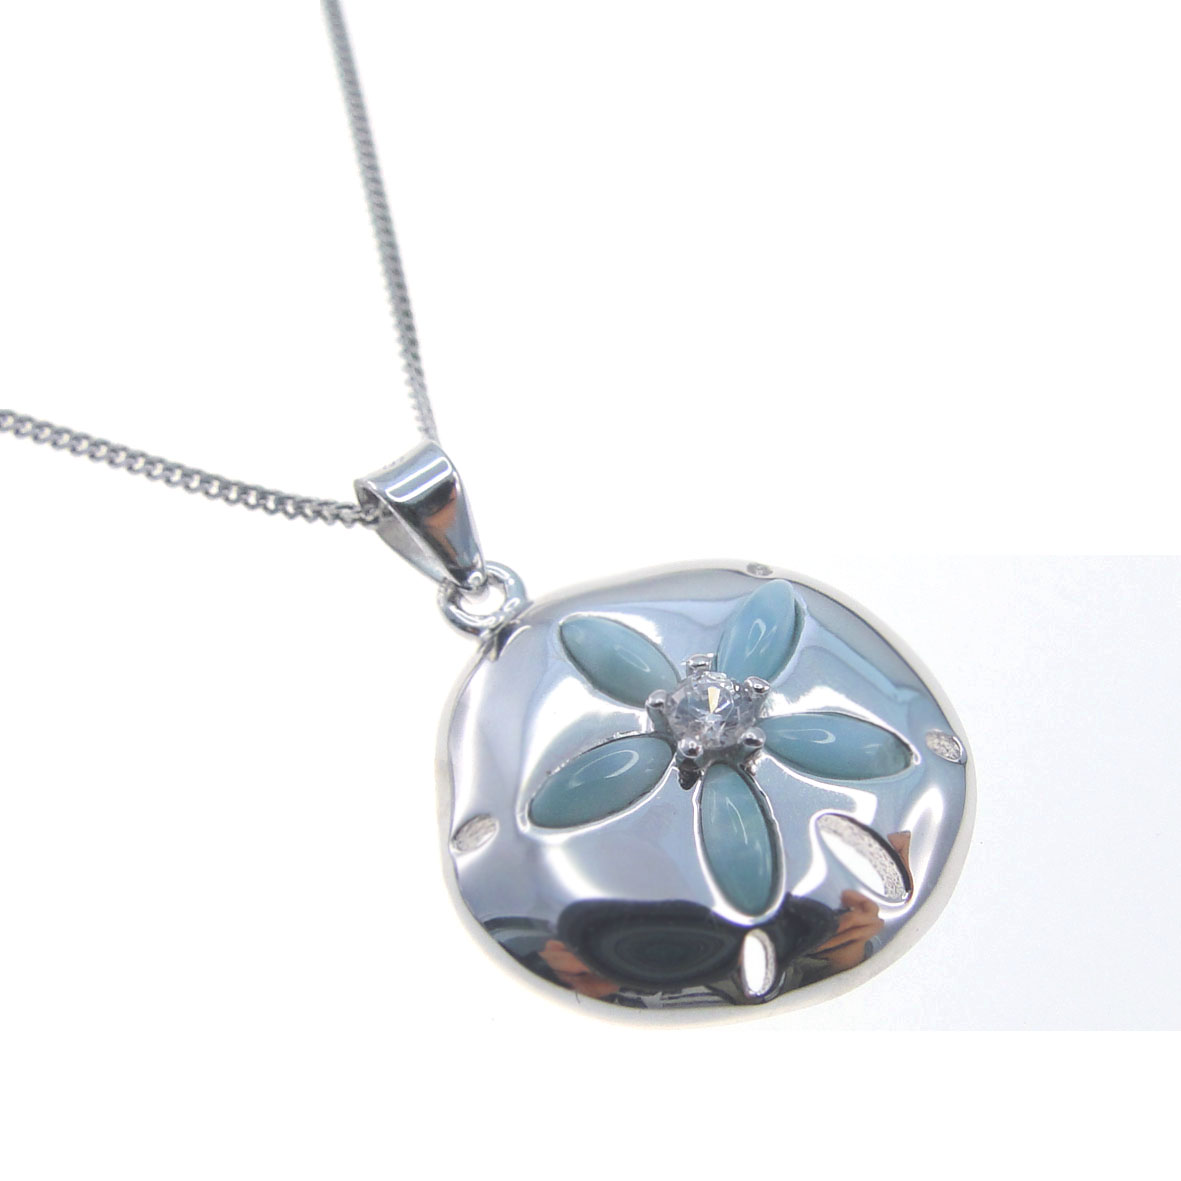 2017 New Designs 925 silver larimar necklace pendants wholesale